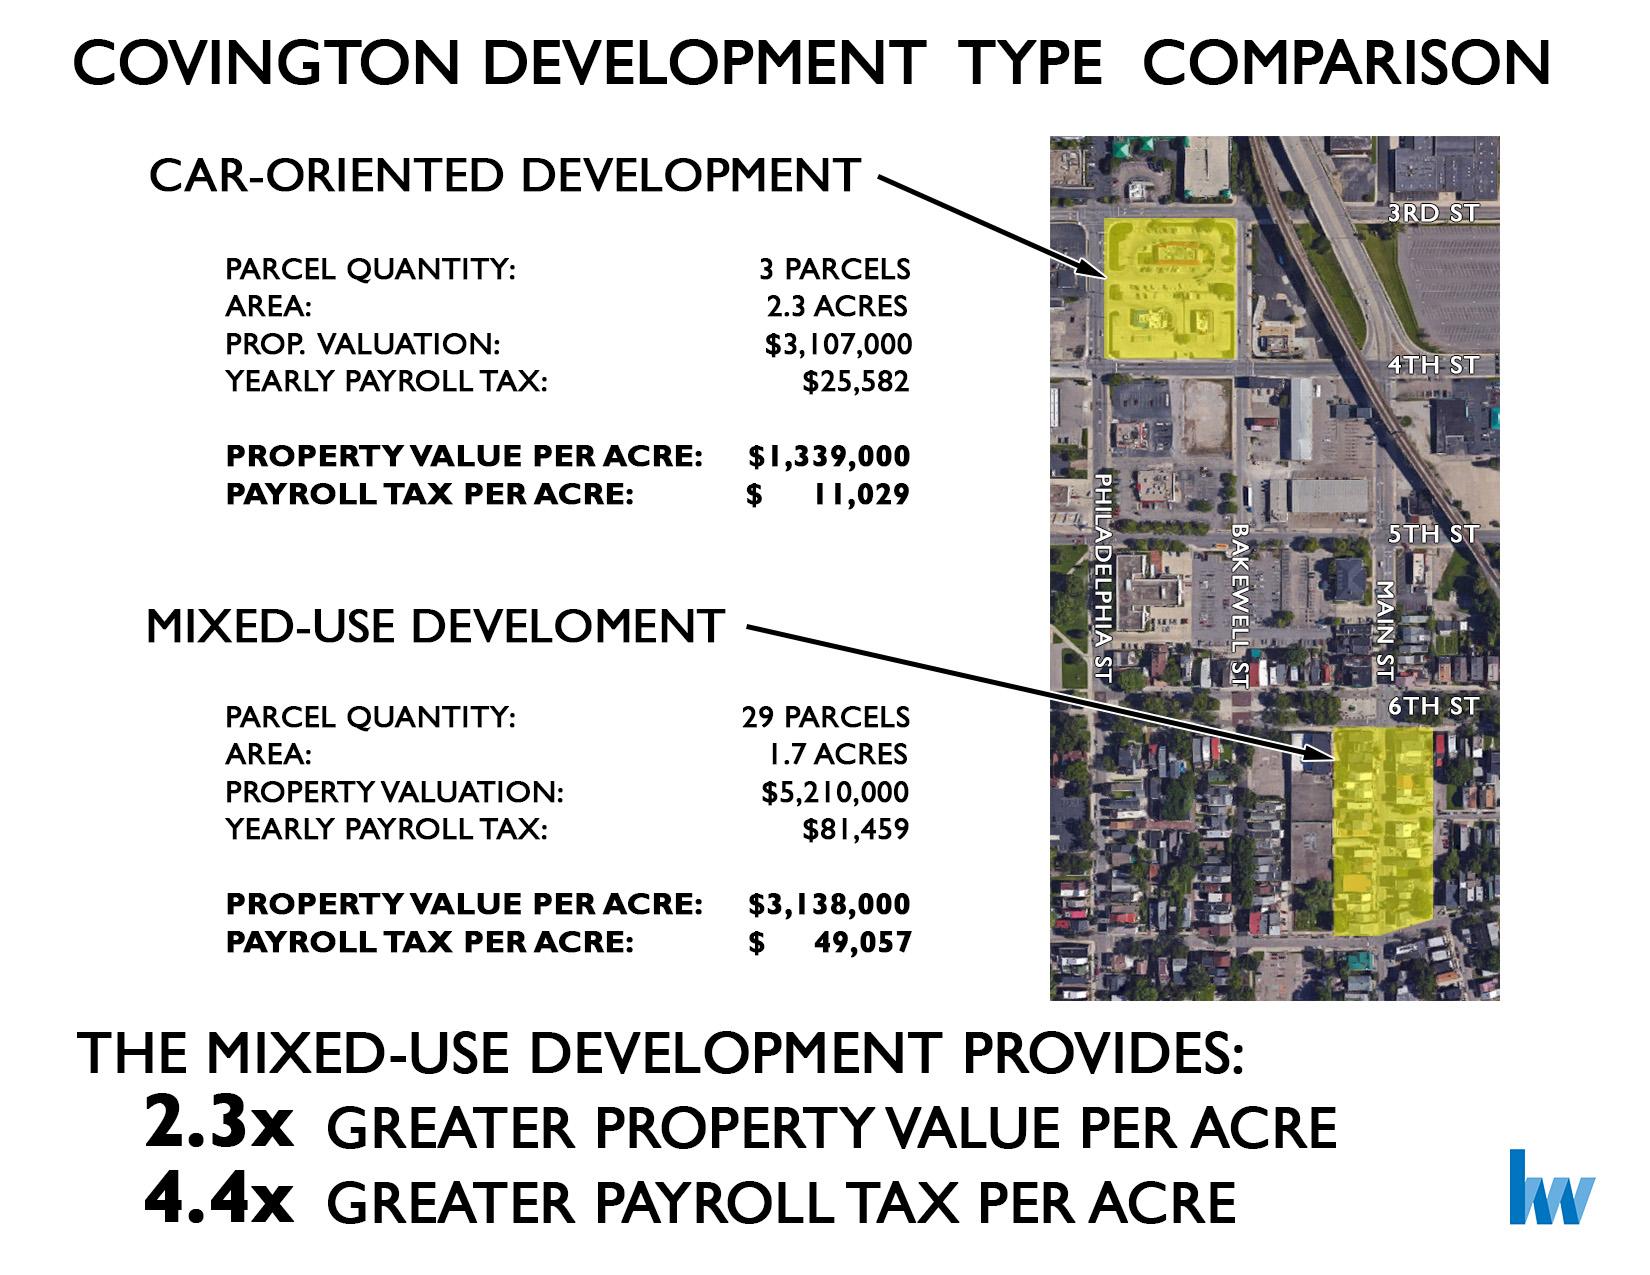 Property Value Comparison Graphic_11-28-2017.jpg